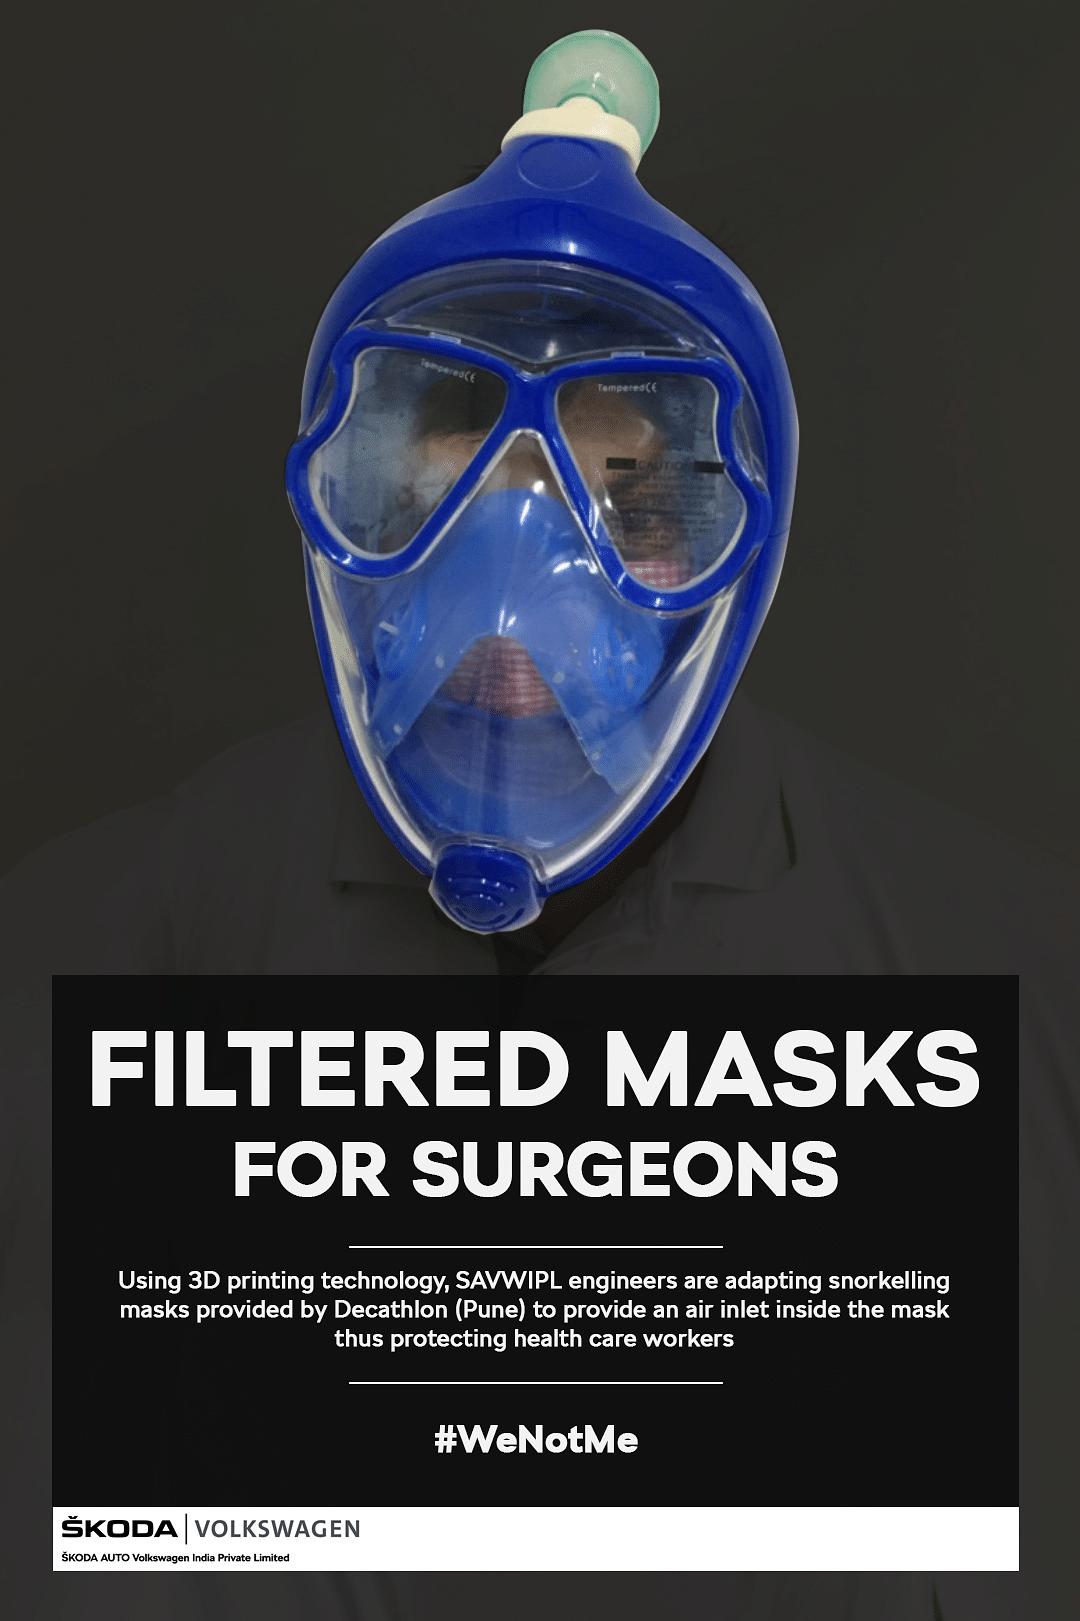 Filtered masks being built using innovative ideas